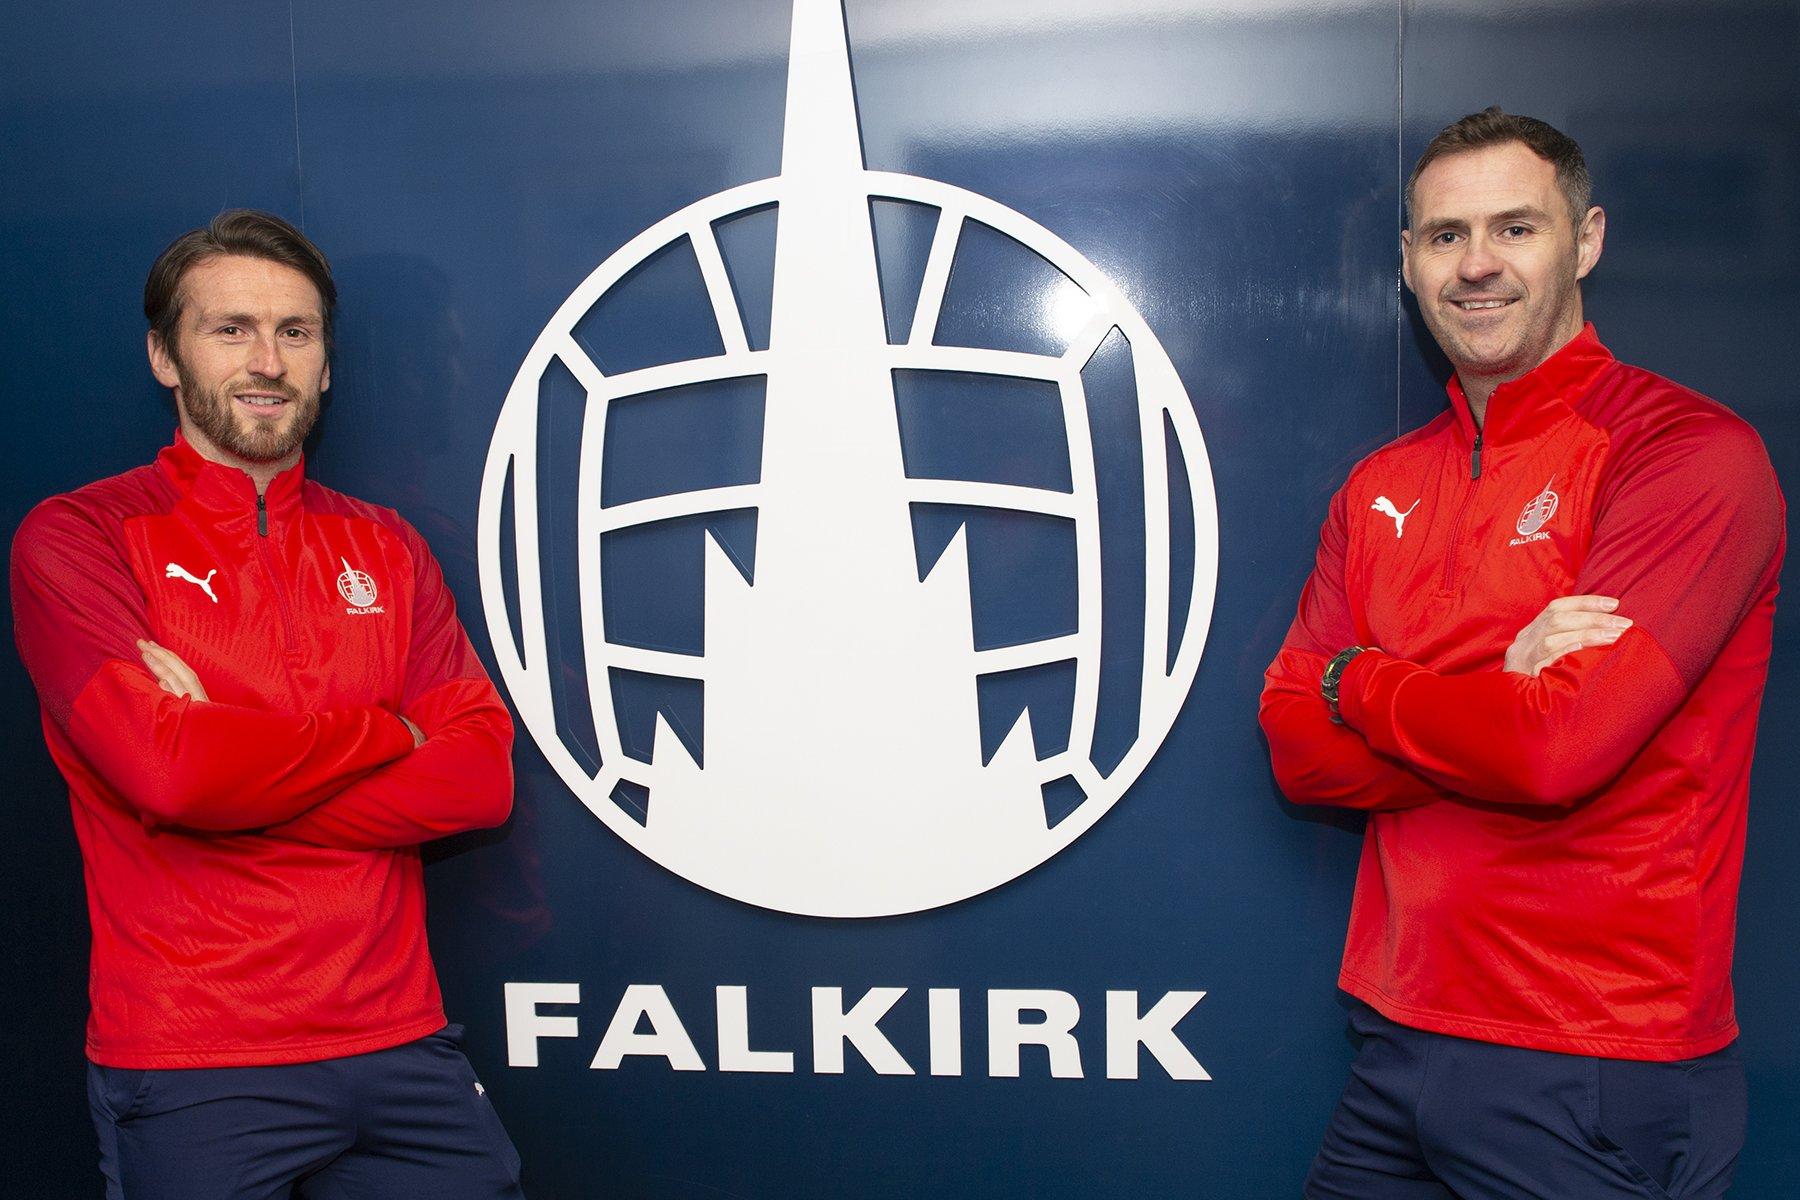 Falkirk interim managers Lee Miller and David McCracken